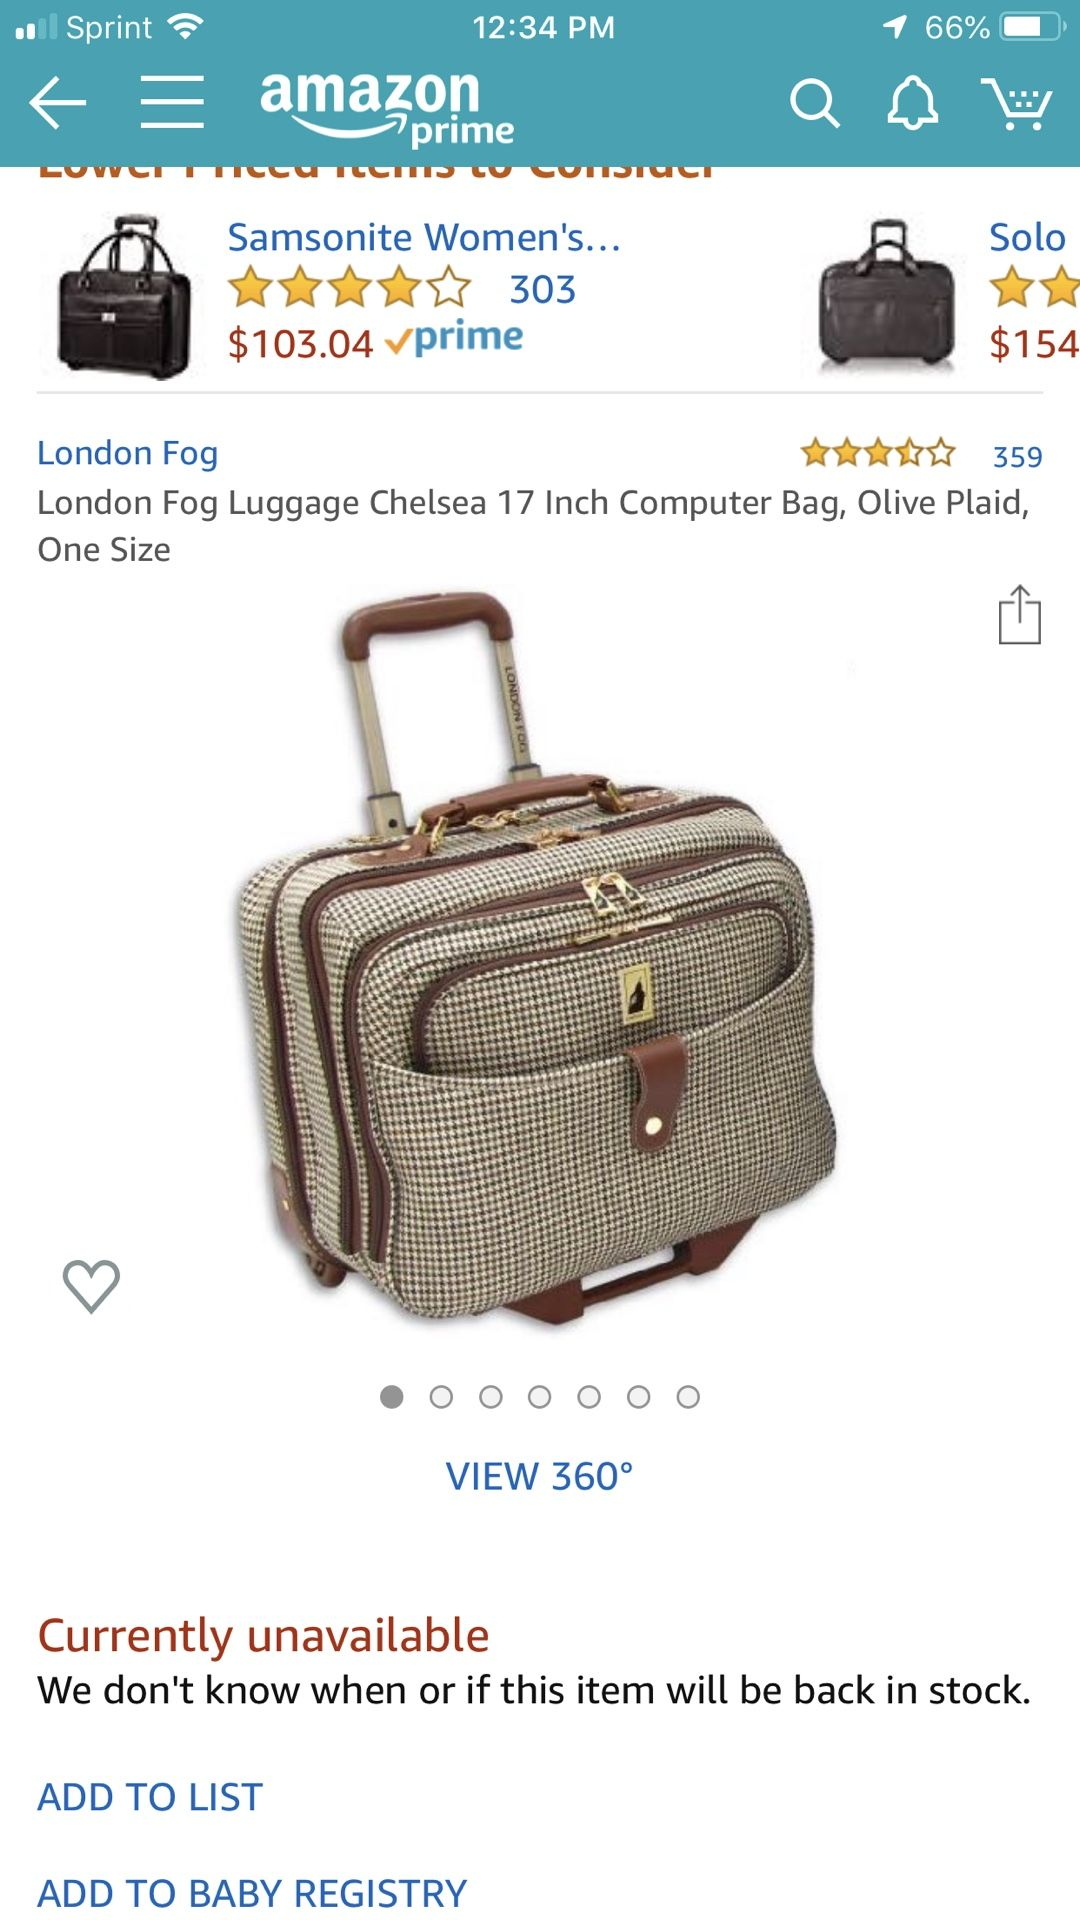 London Fog Rolling bag